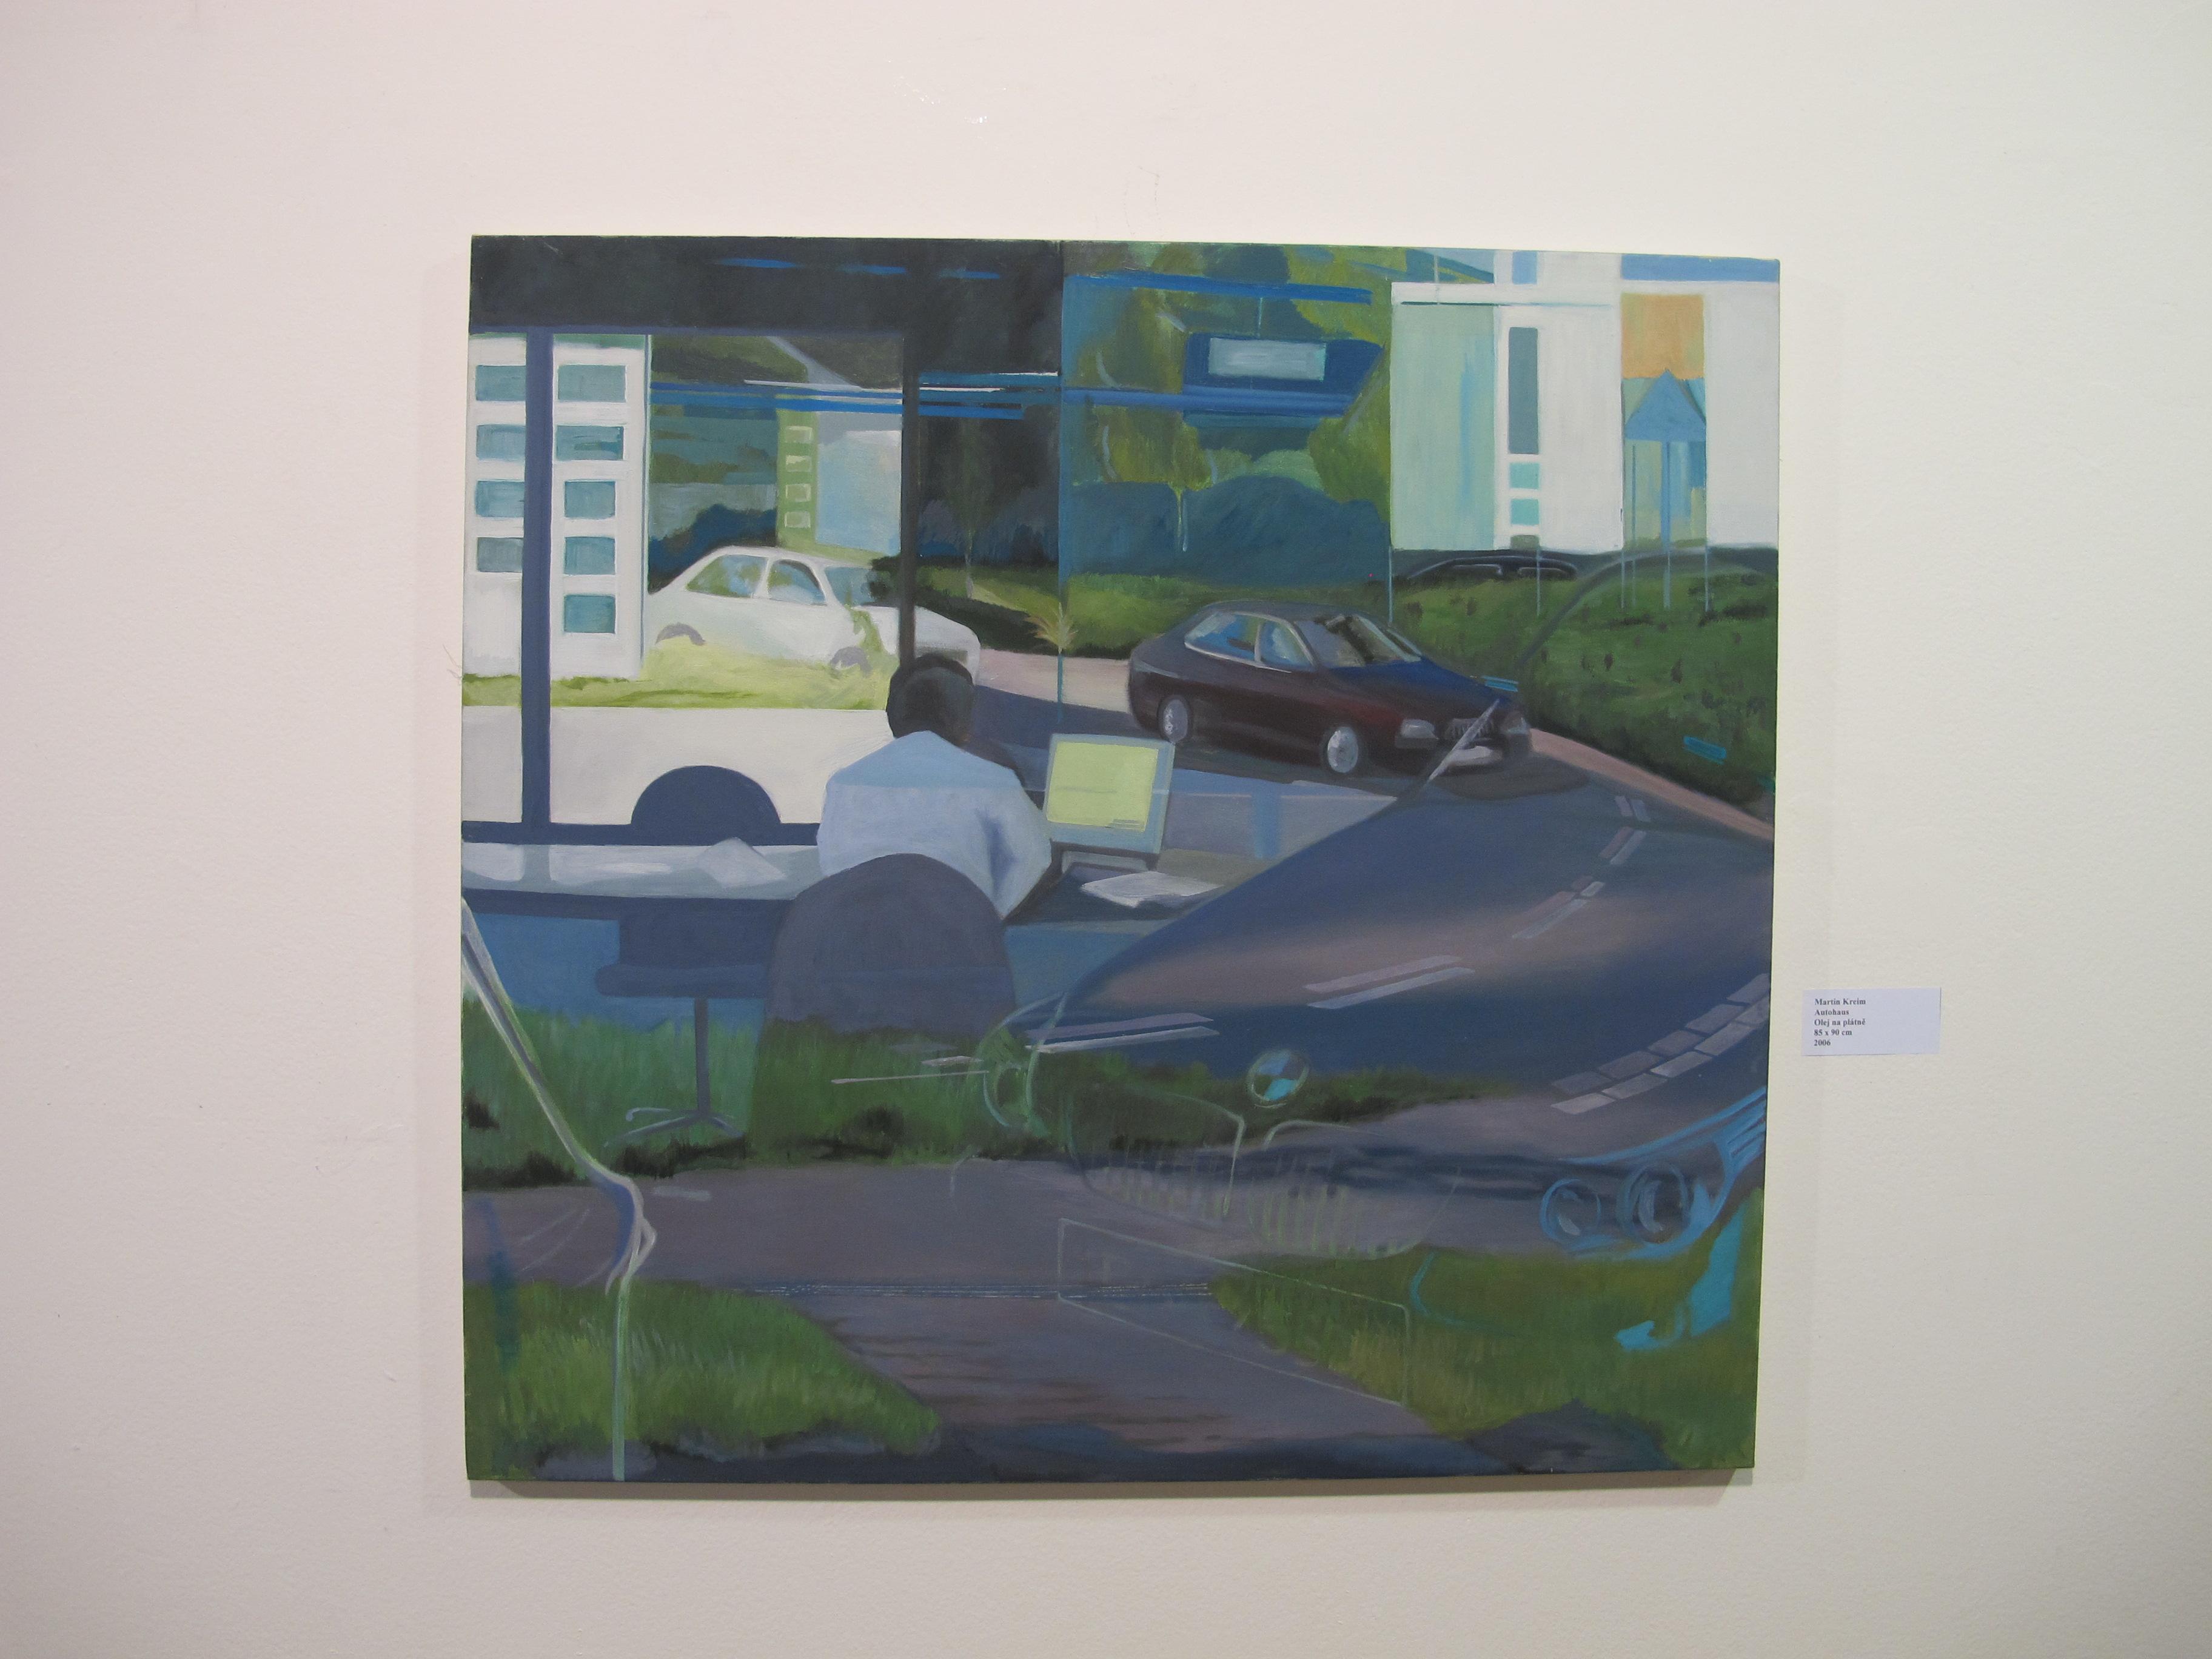 Martin Kreim, Autohaus